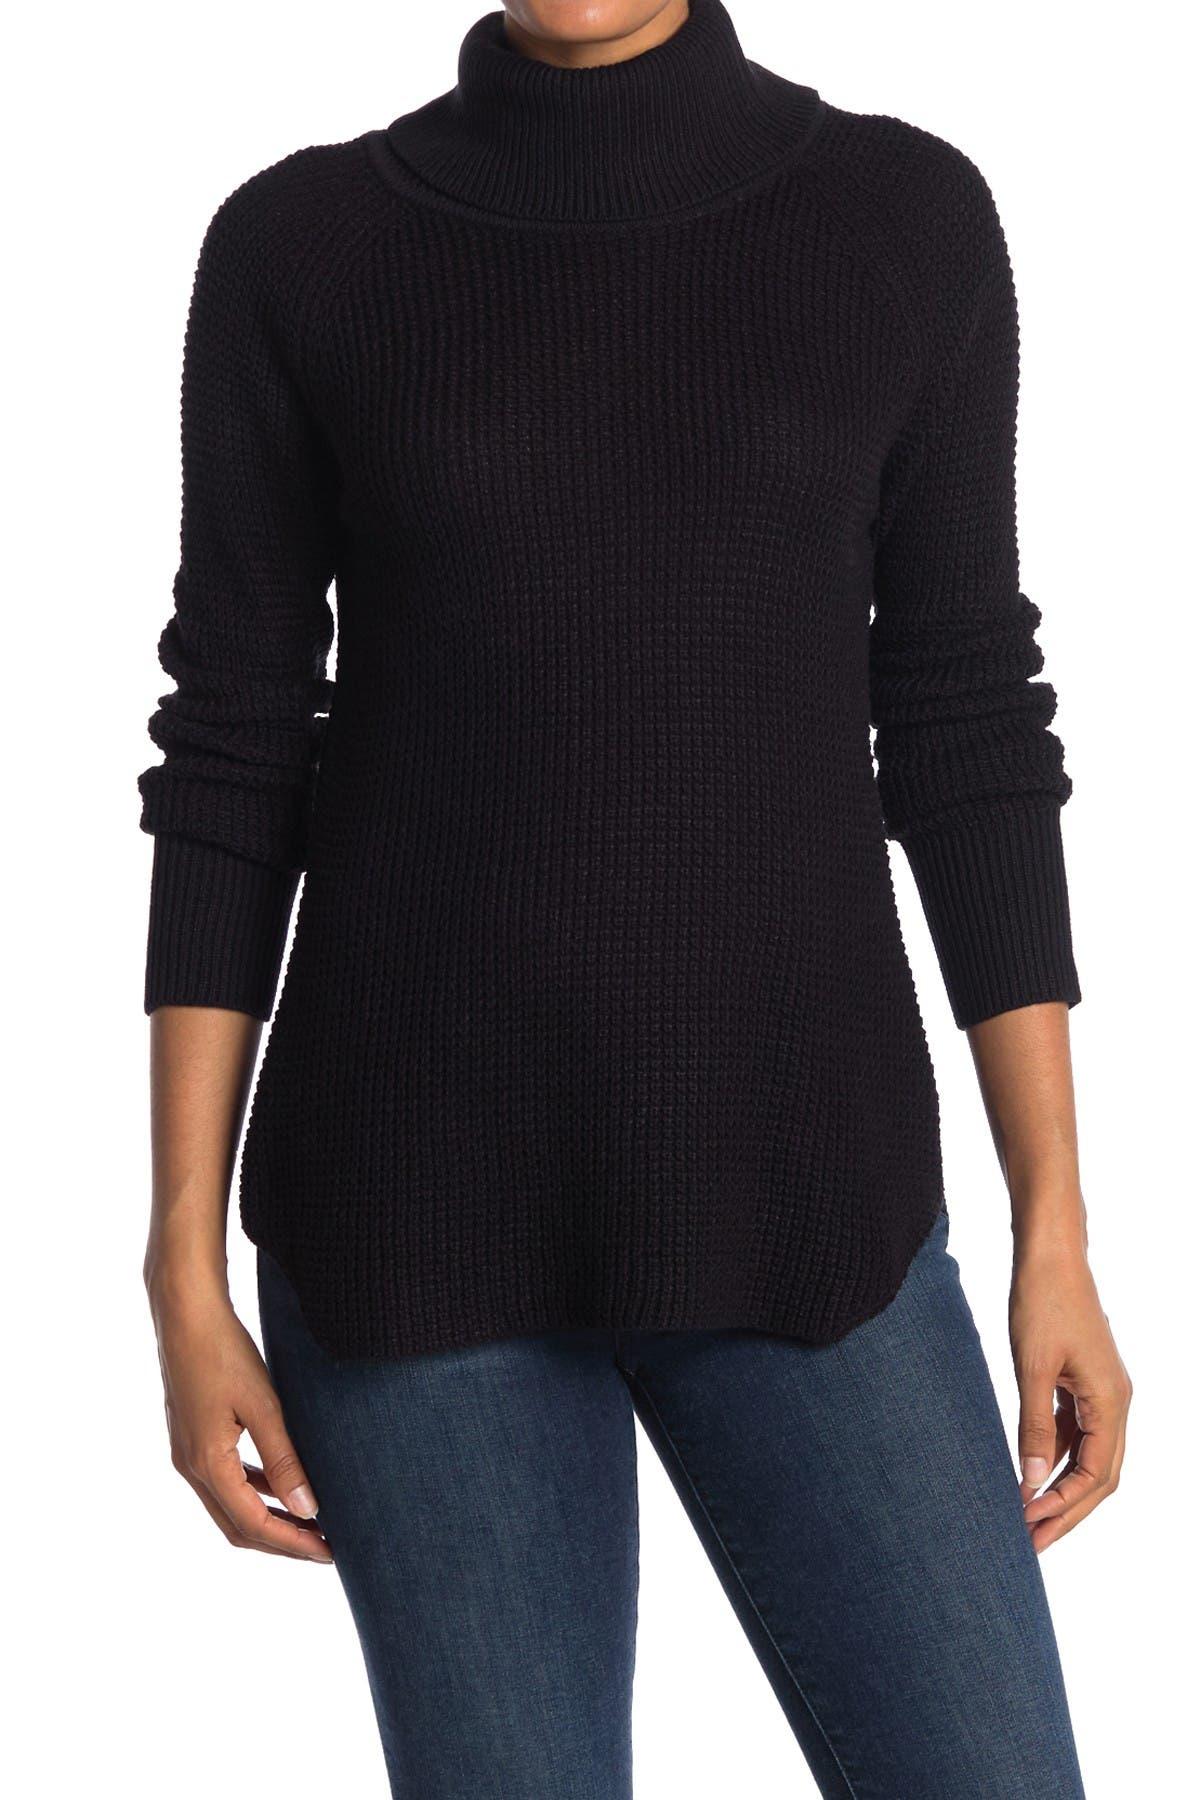 Image of Cloth By Design Turtleneck Raglan Sleeve Sweater